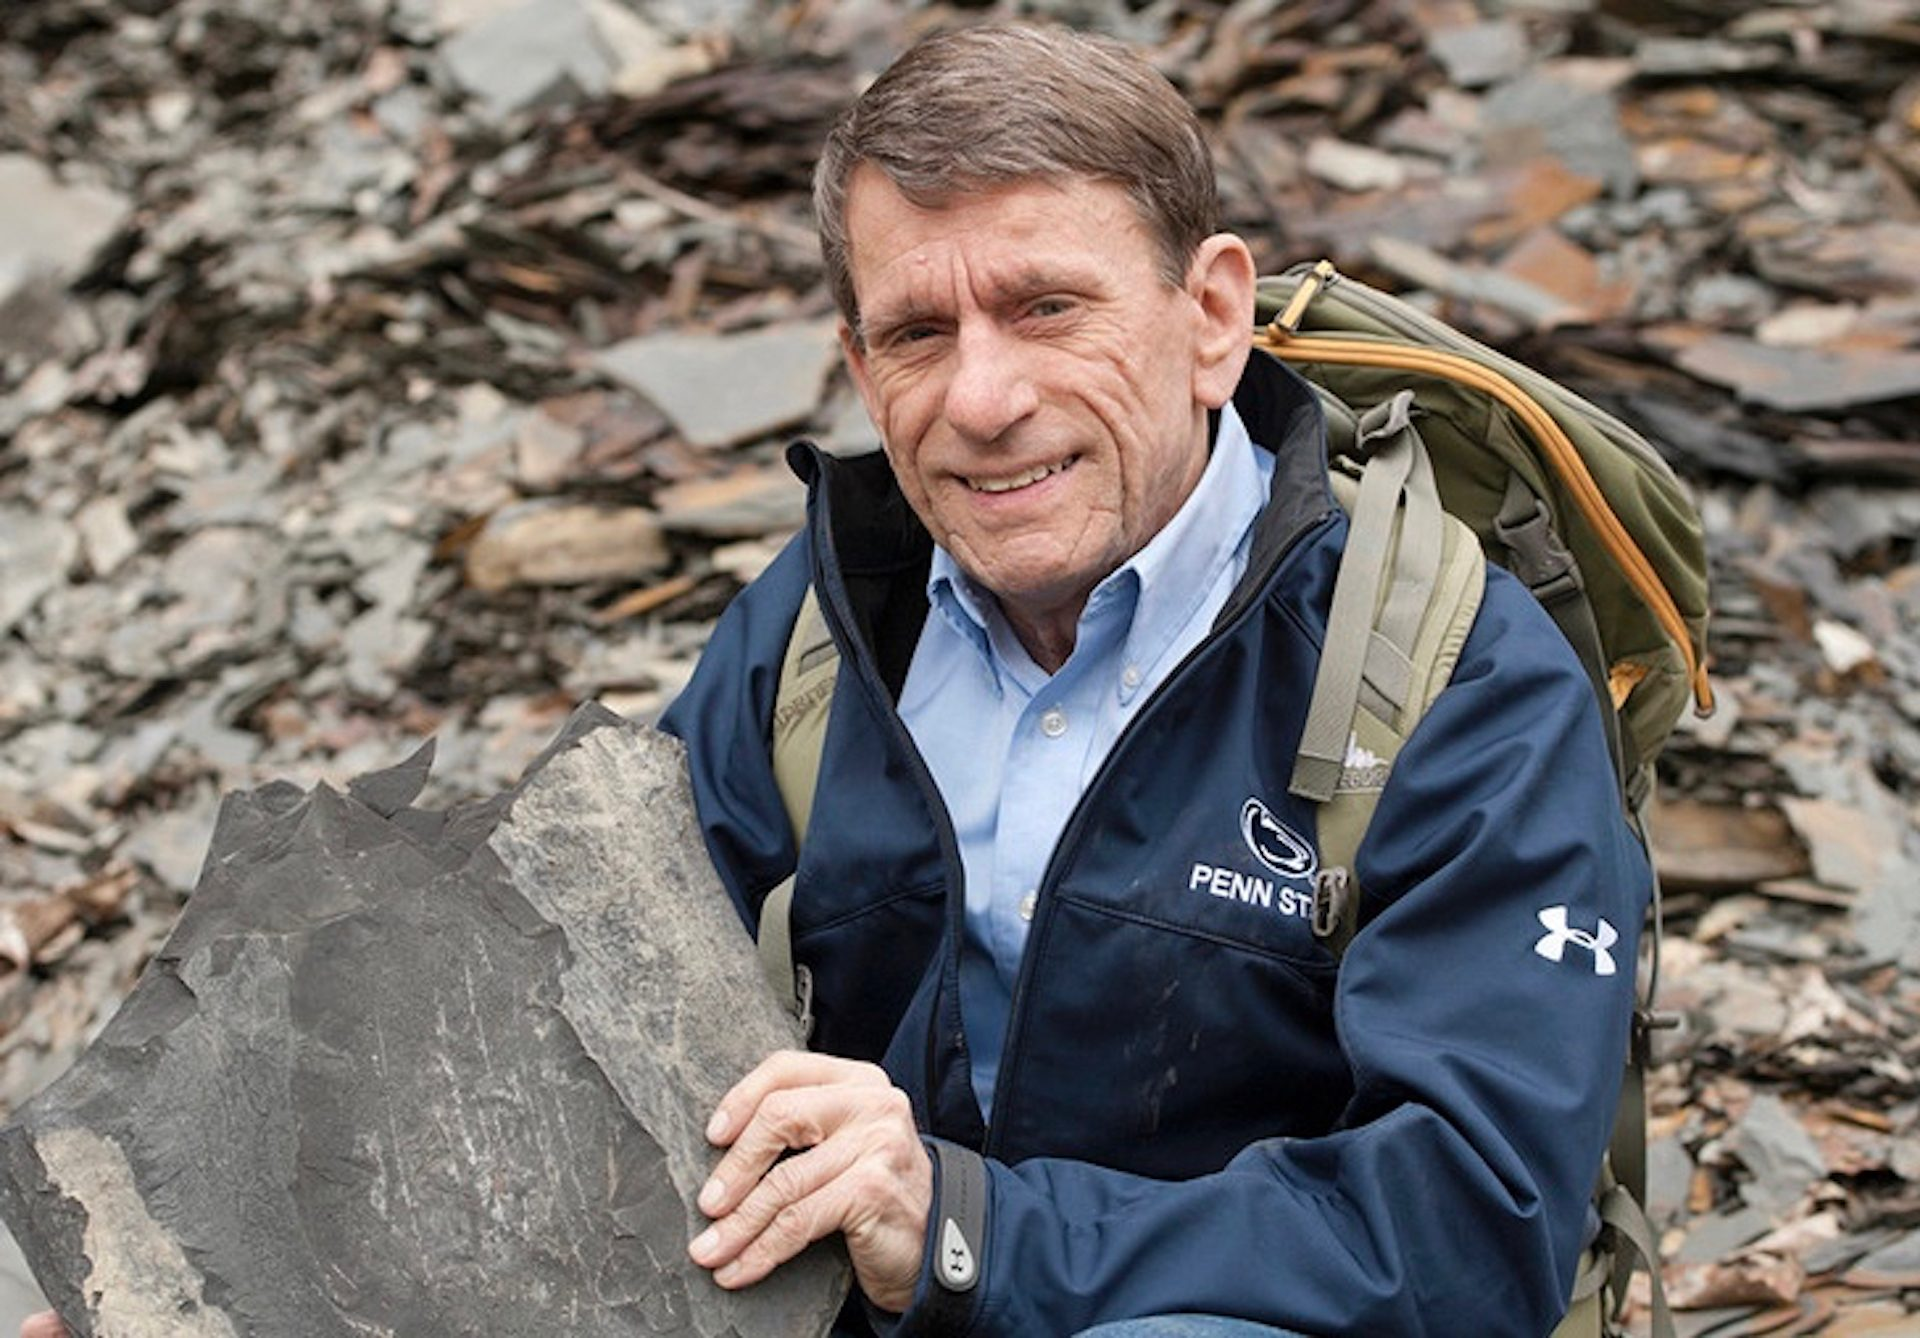 Terry Engelder, professor emeritus of geosciences at Penn State